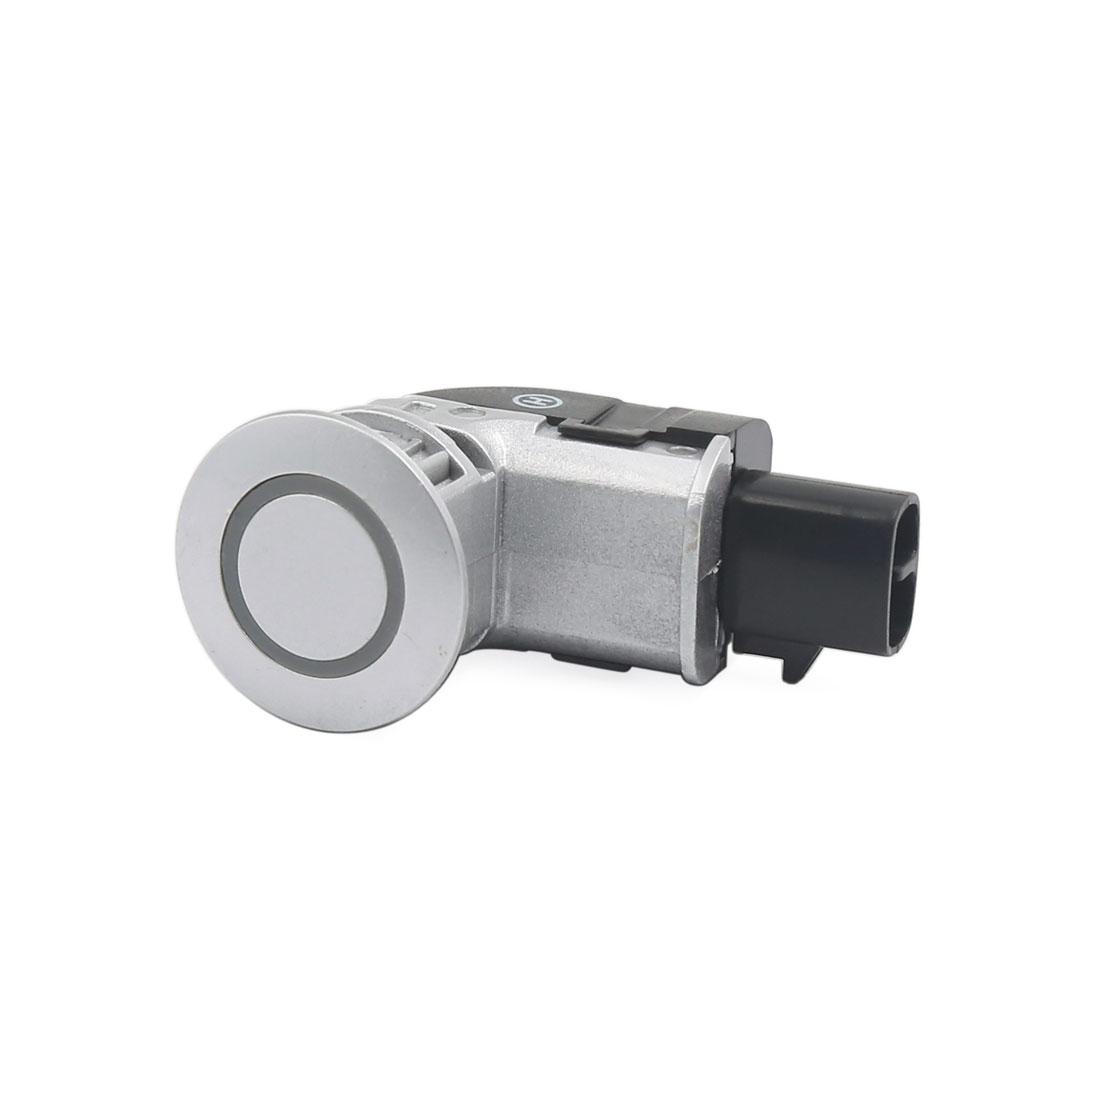 Silver Tone PDC Ultrasonic Reverse Parking Sensor for Lexus LS430 89341-50011